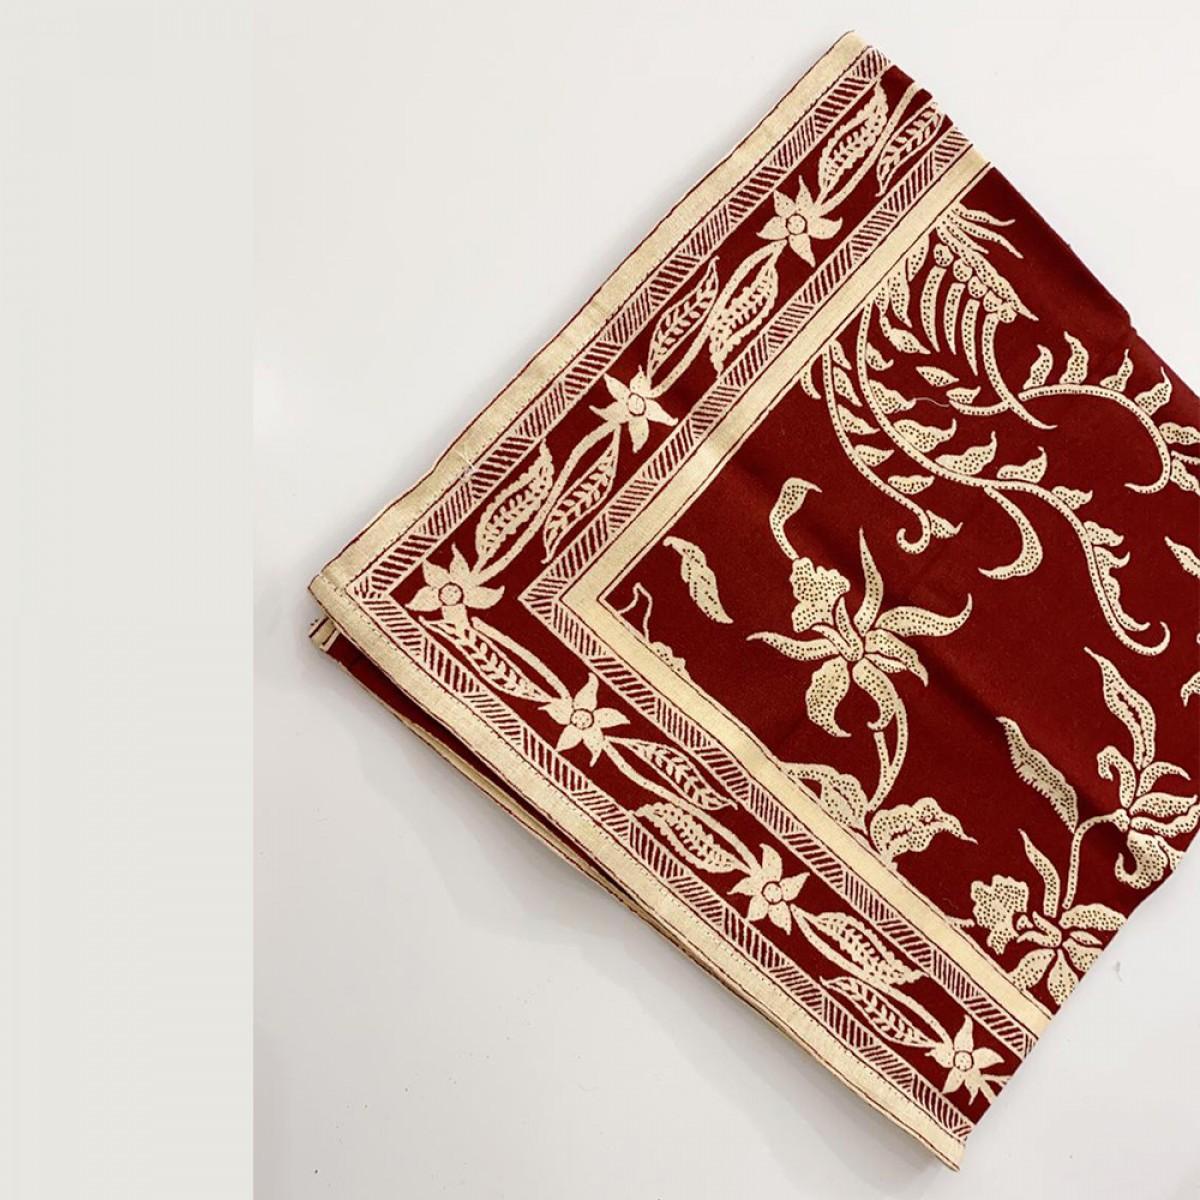 Cotton Printed Napkin - Maroon (Set of 6)